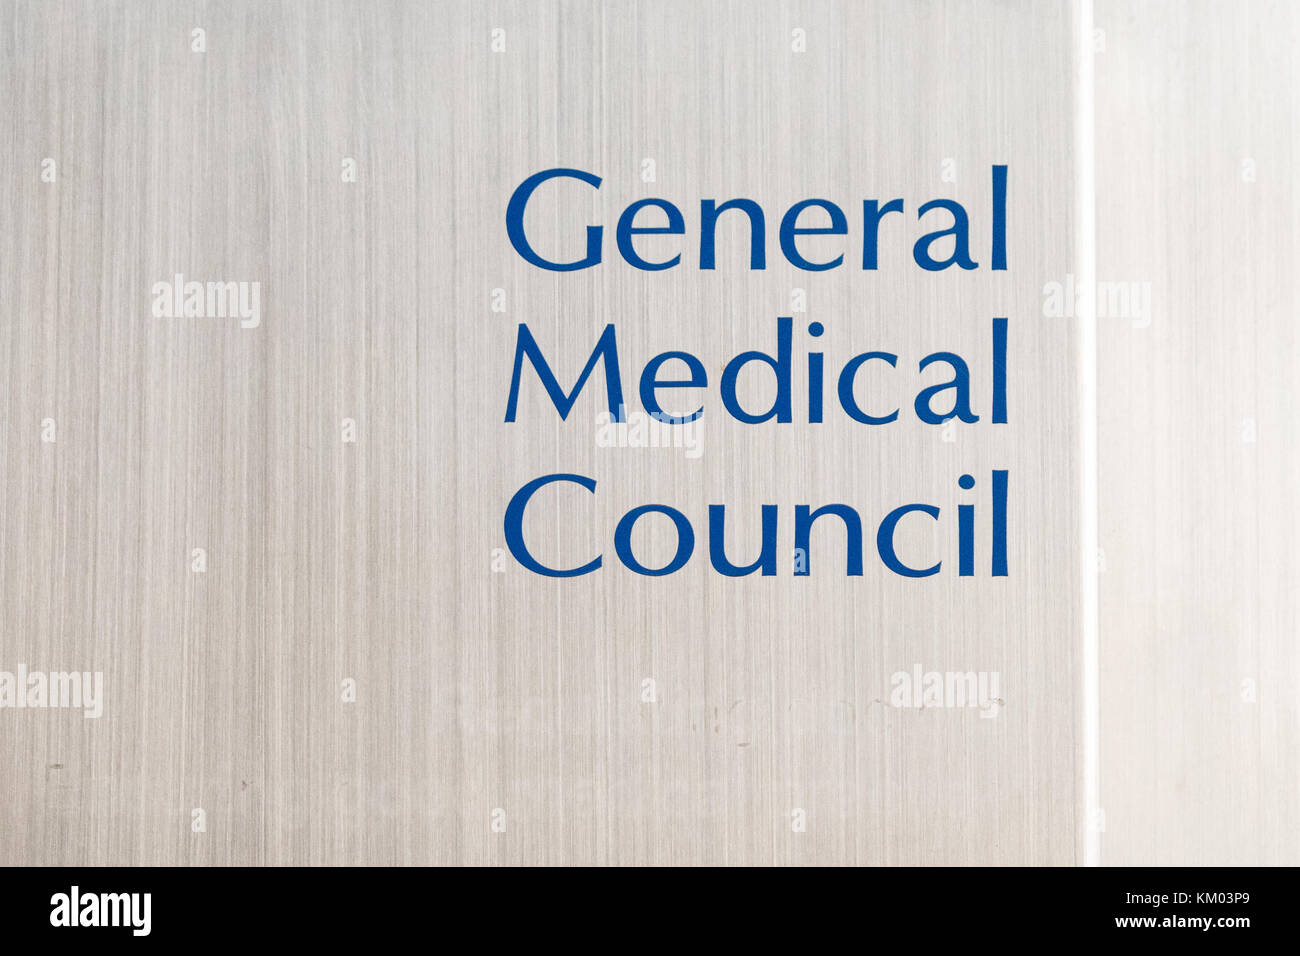 General Medical Council sign in Edinburgh, Scotland, UK - Stock Image